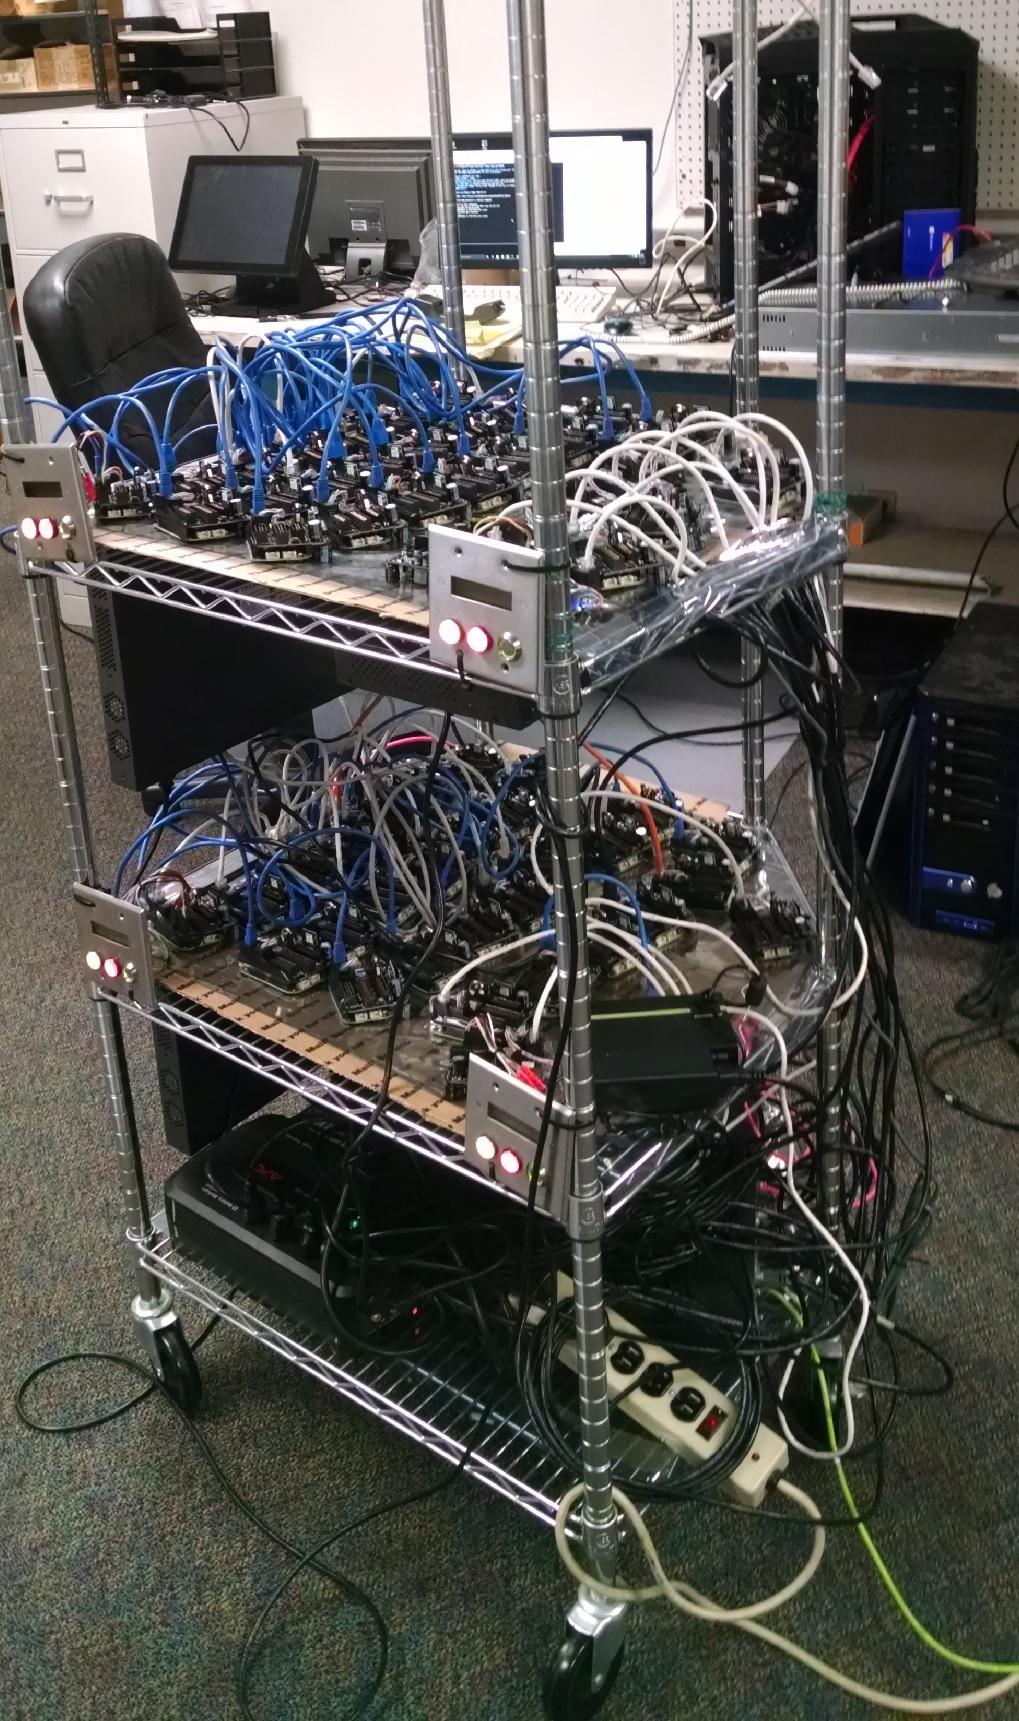 bbb-rack-small.jpg